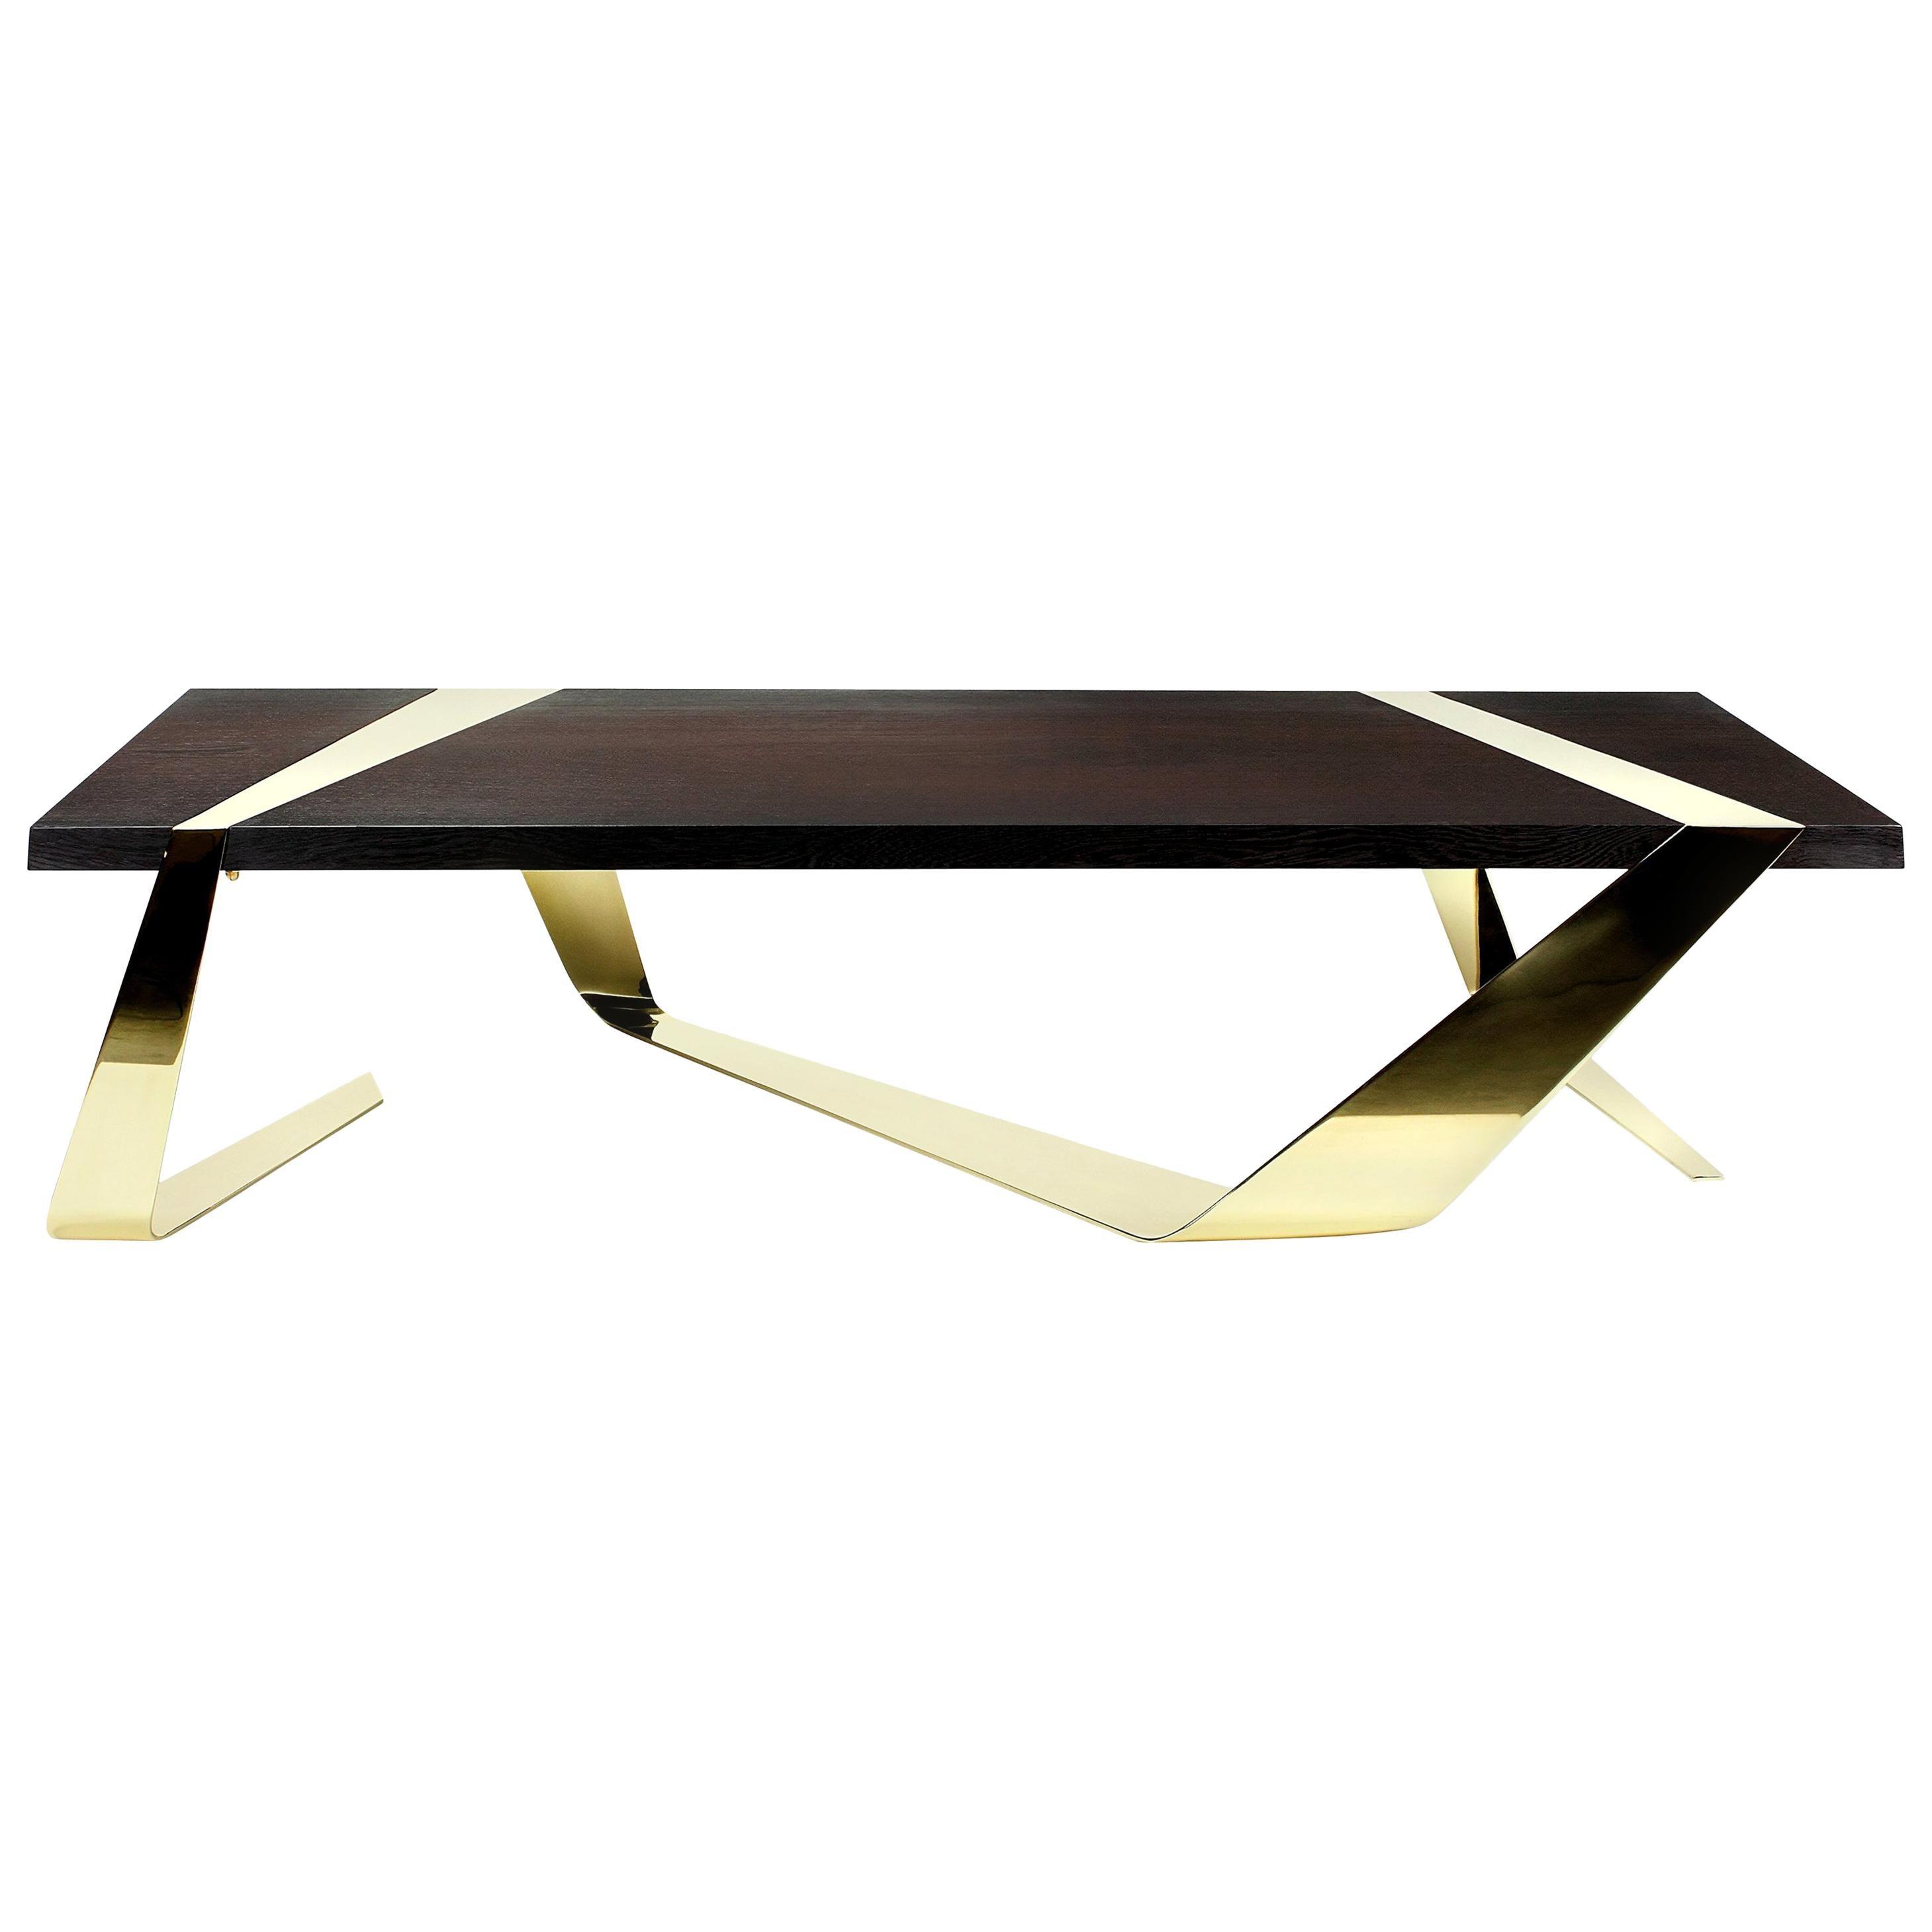 Coffee Table Contemporary Design Futuristic Wood Brass Italian Limited Edition